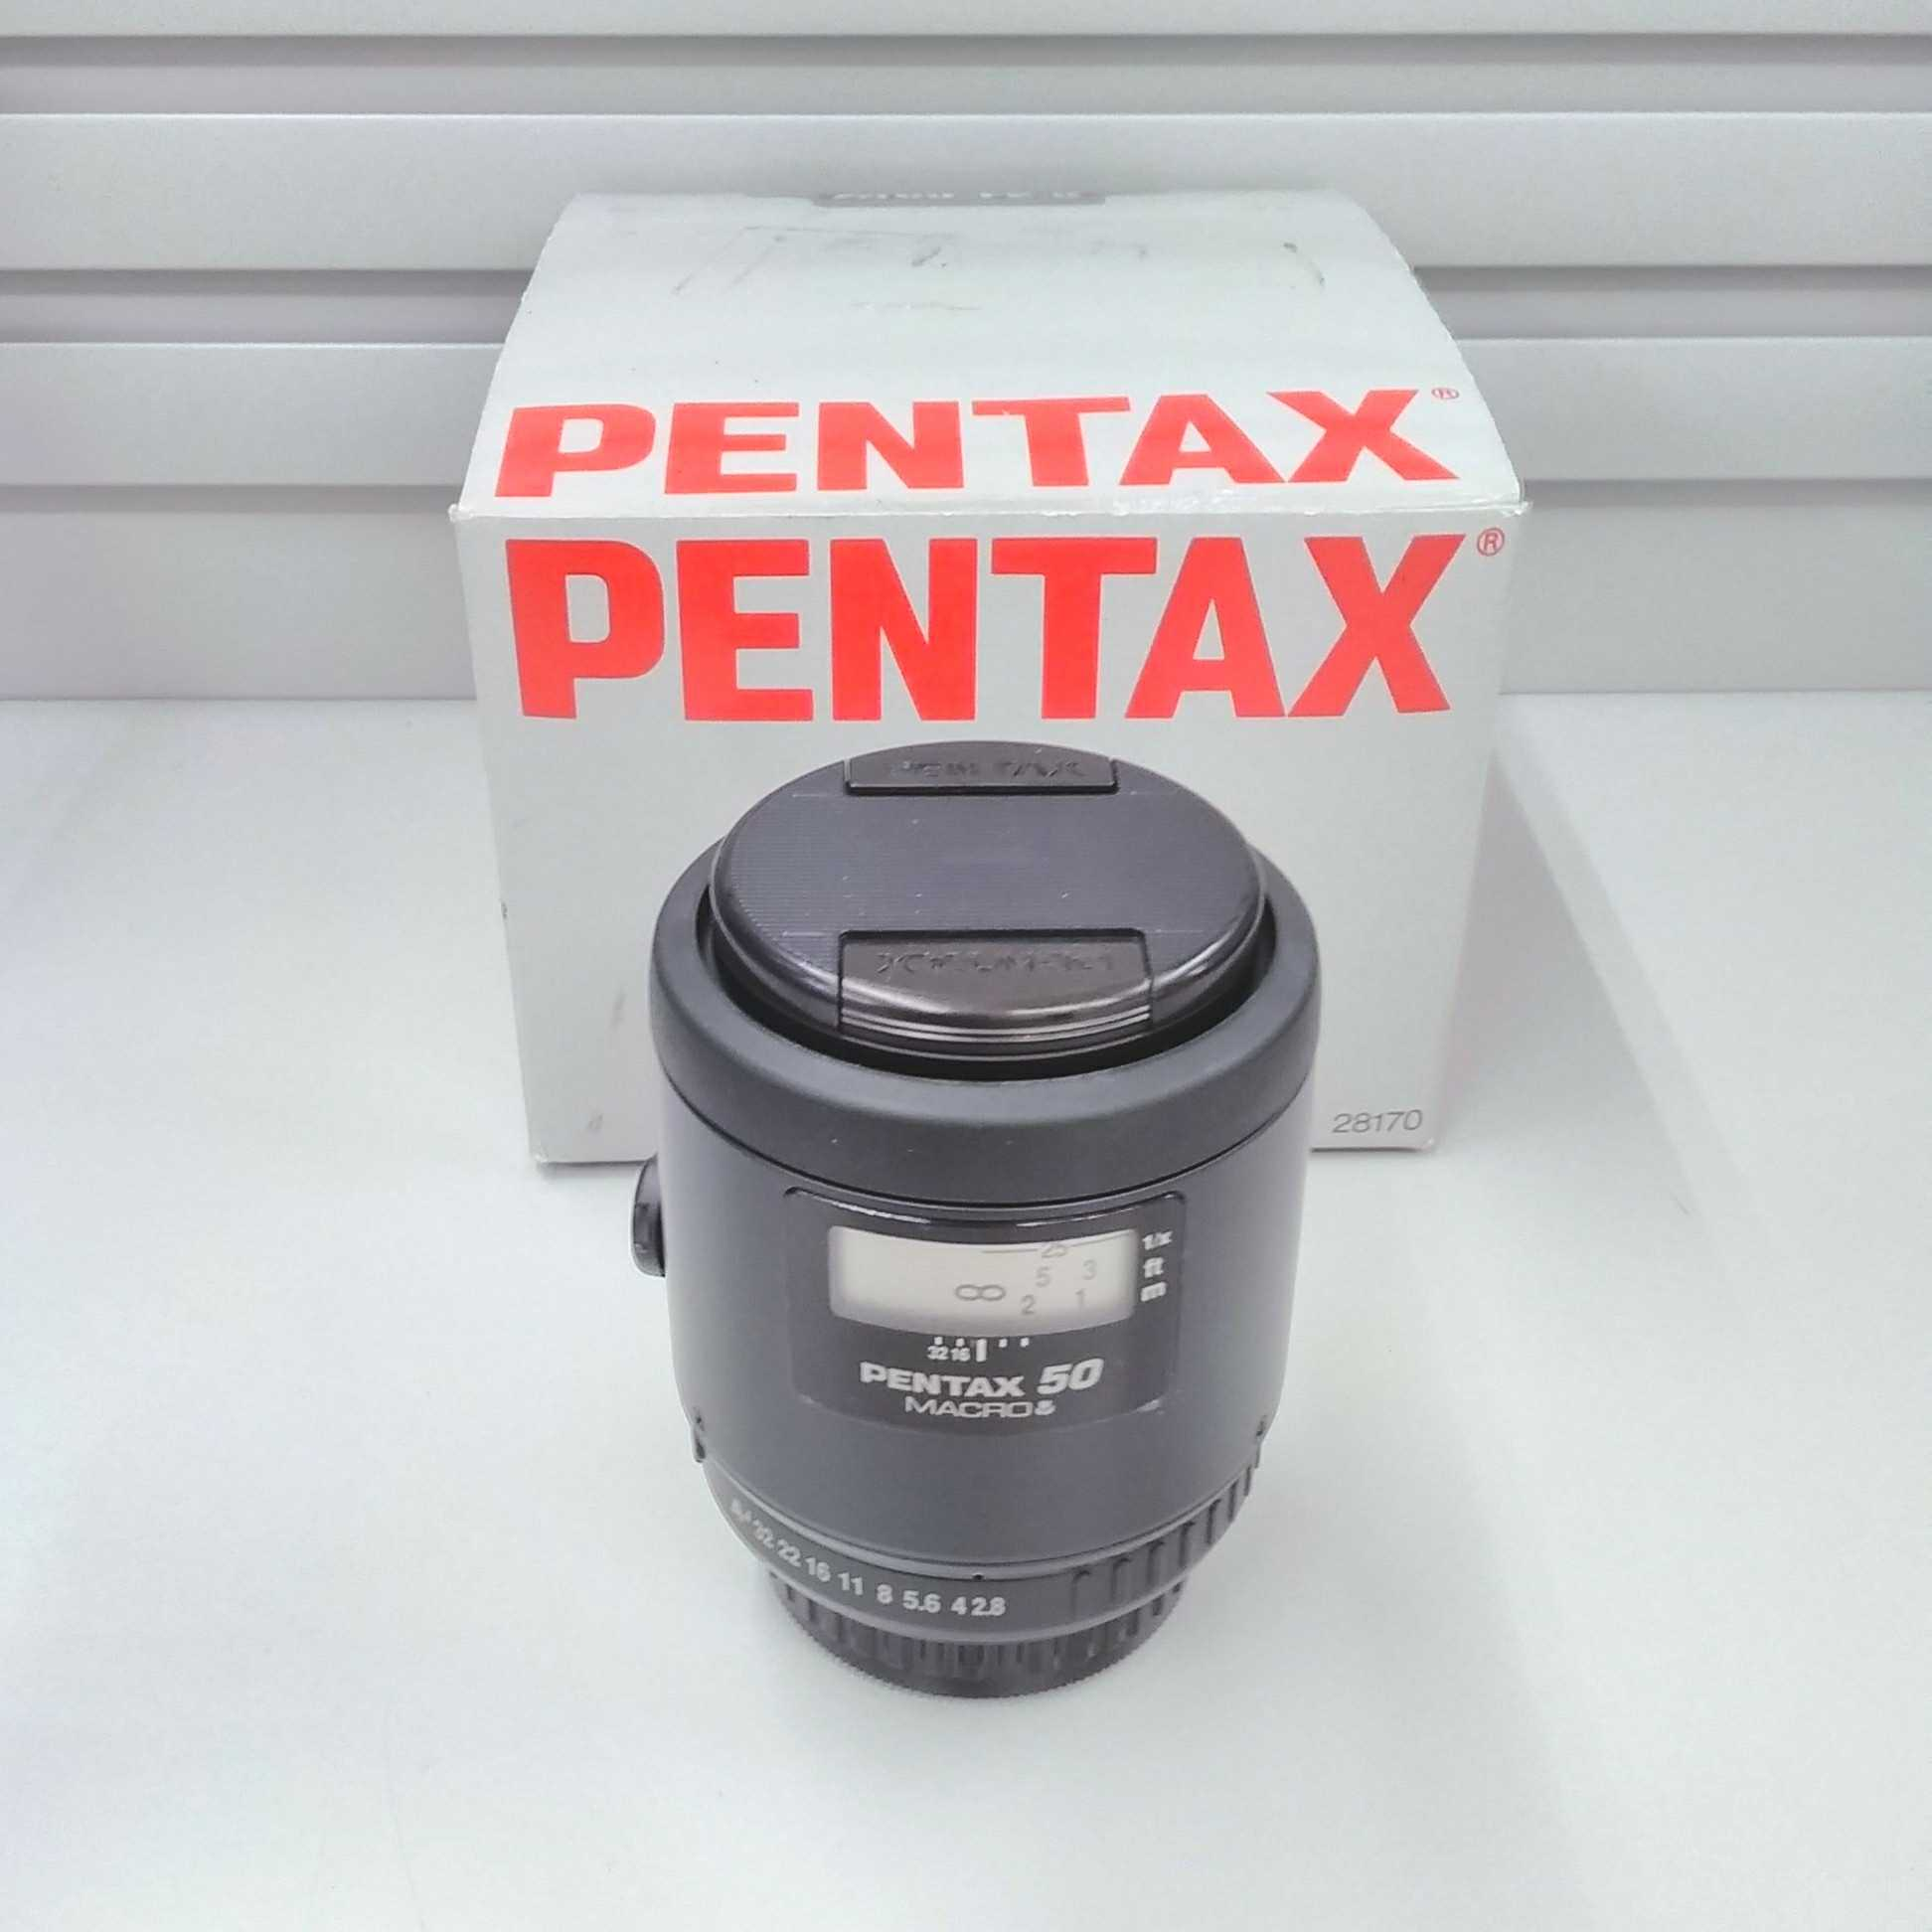 Kマウントレンズ SMC FA MACRO50mmF2.8 PENTAX